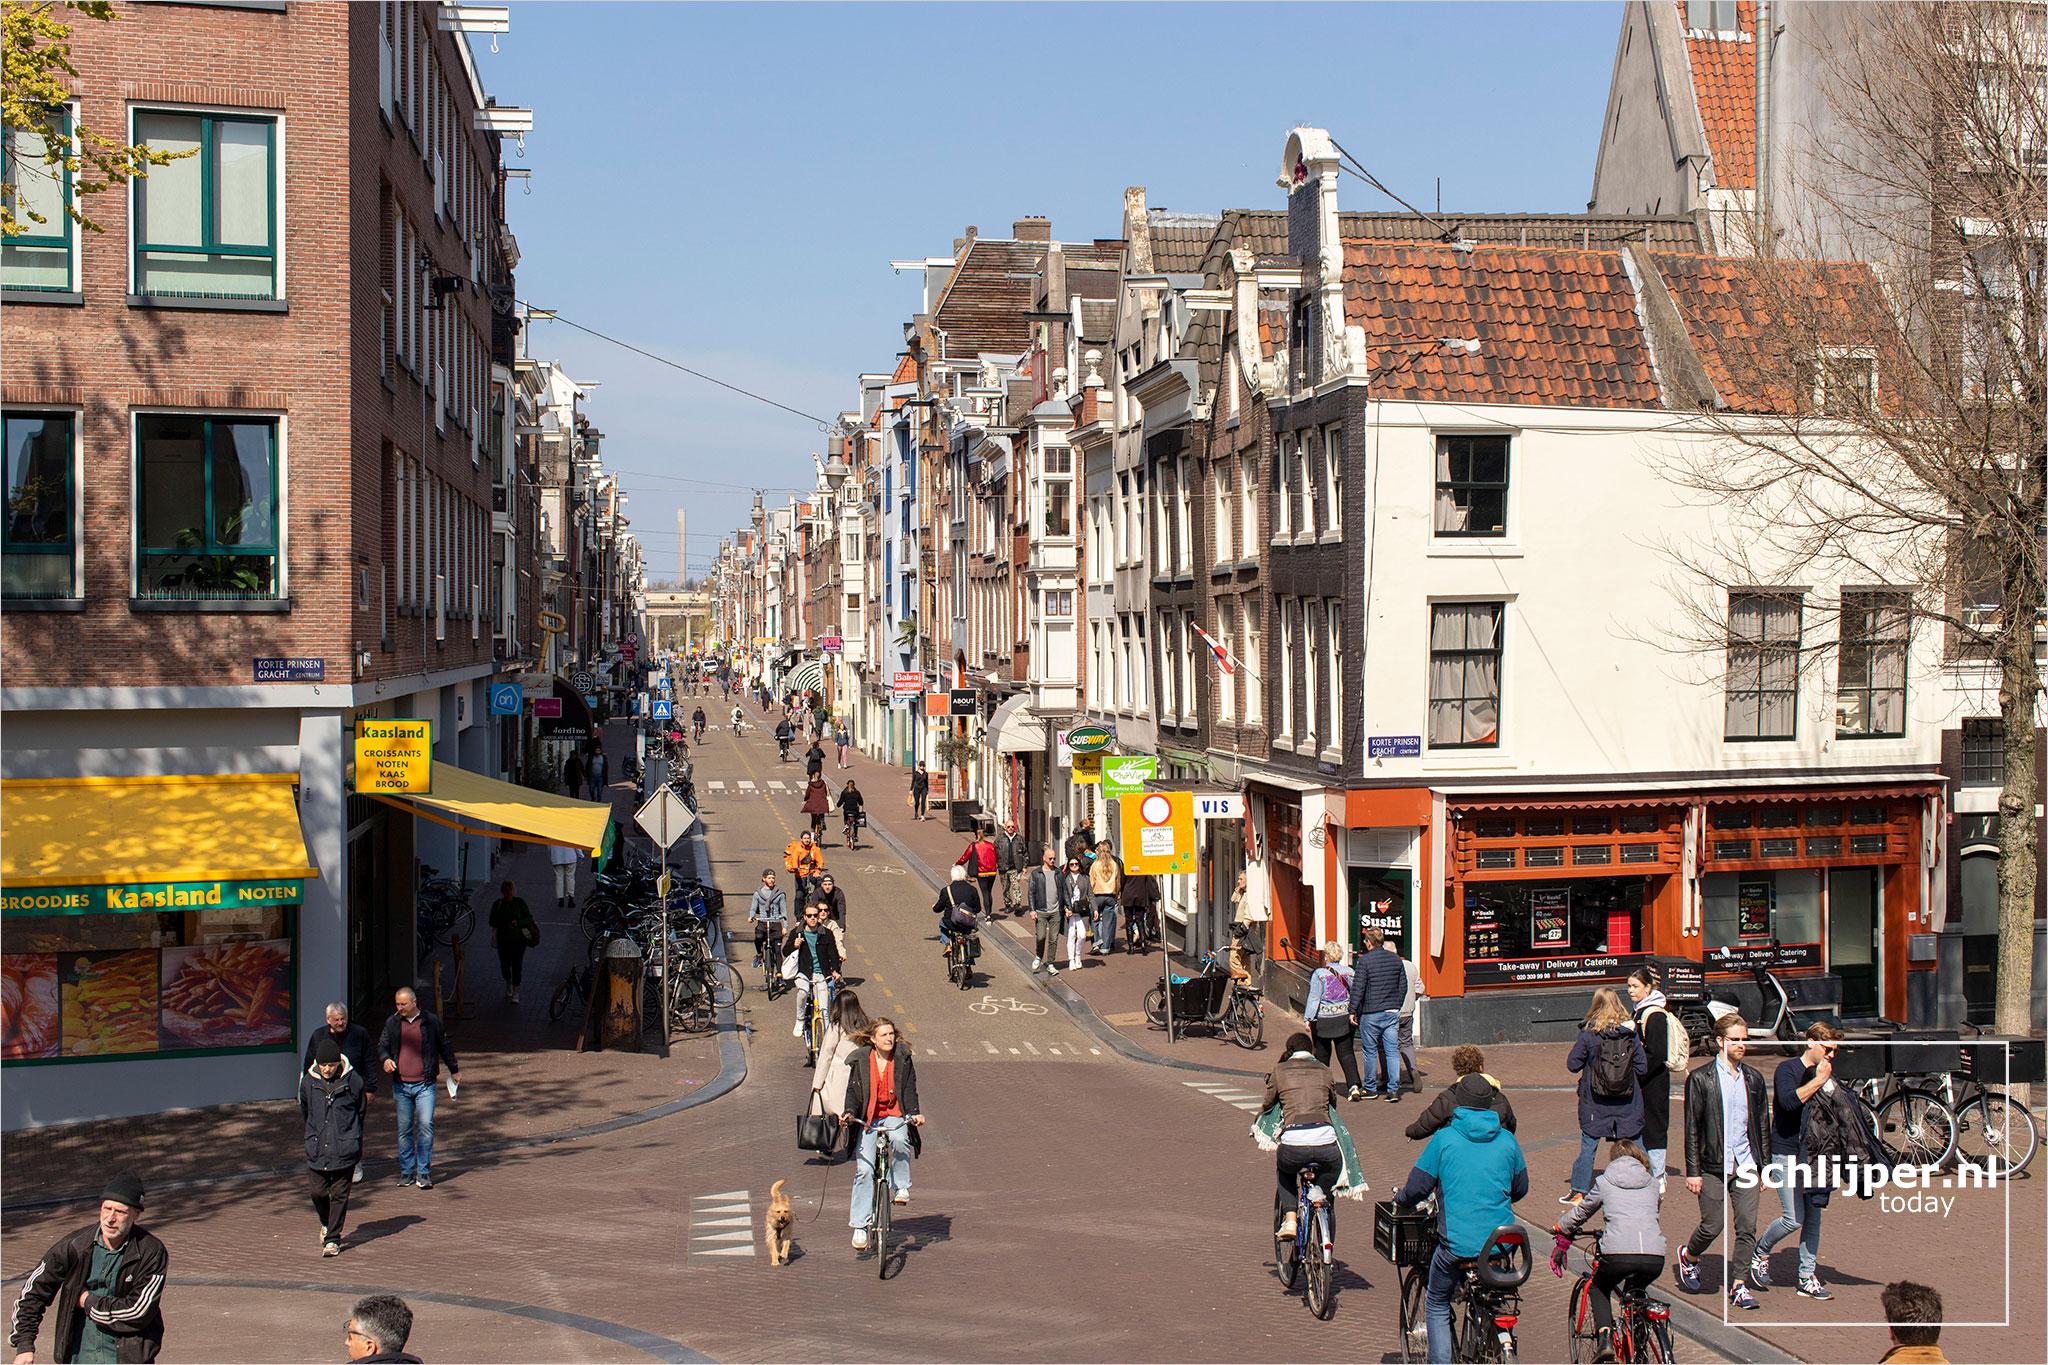 The Netherlands, Amsterdam, 18 april 2021